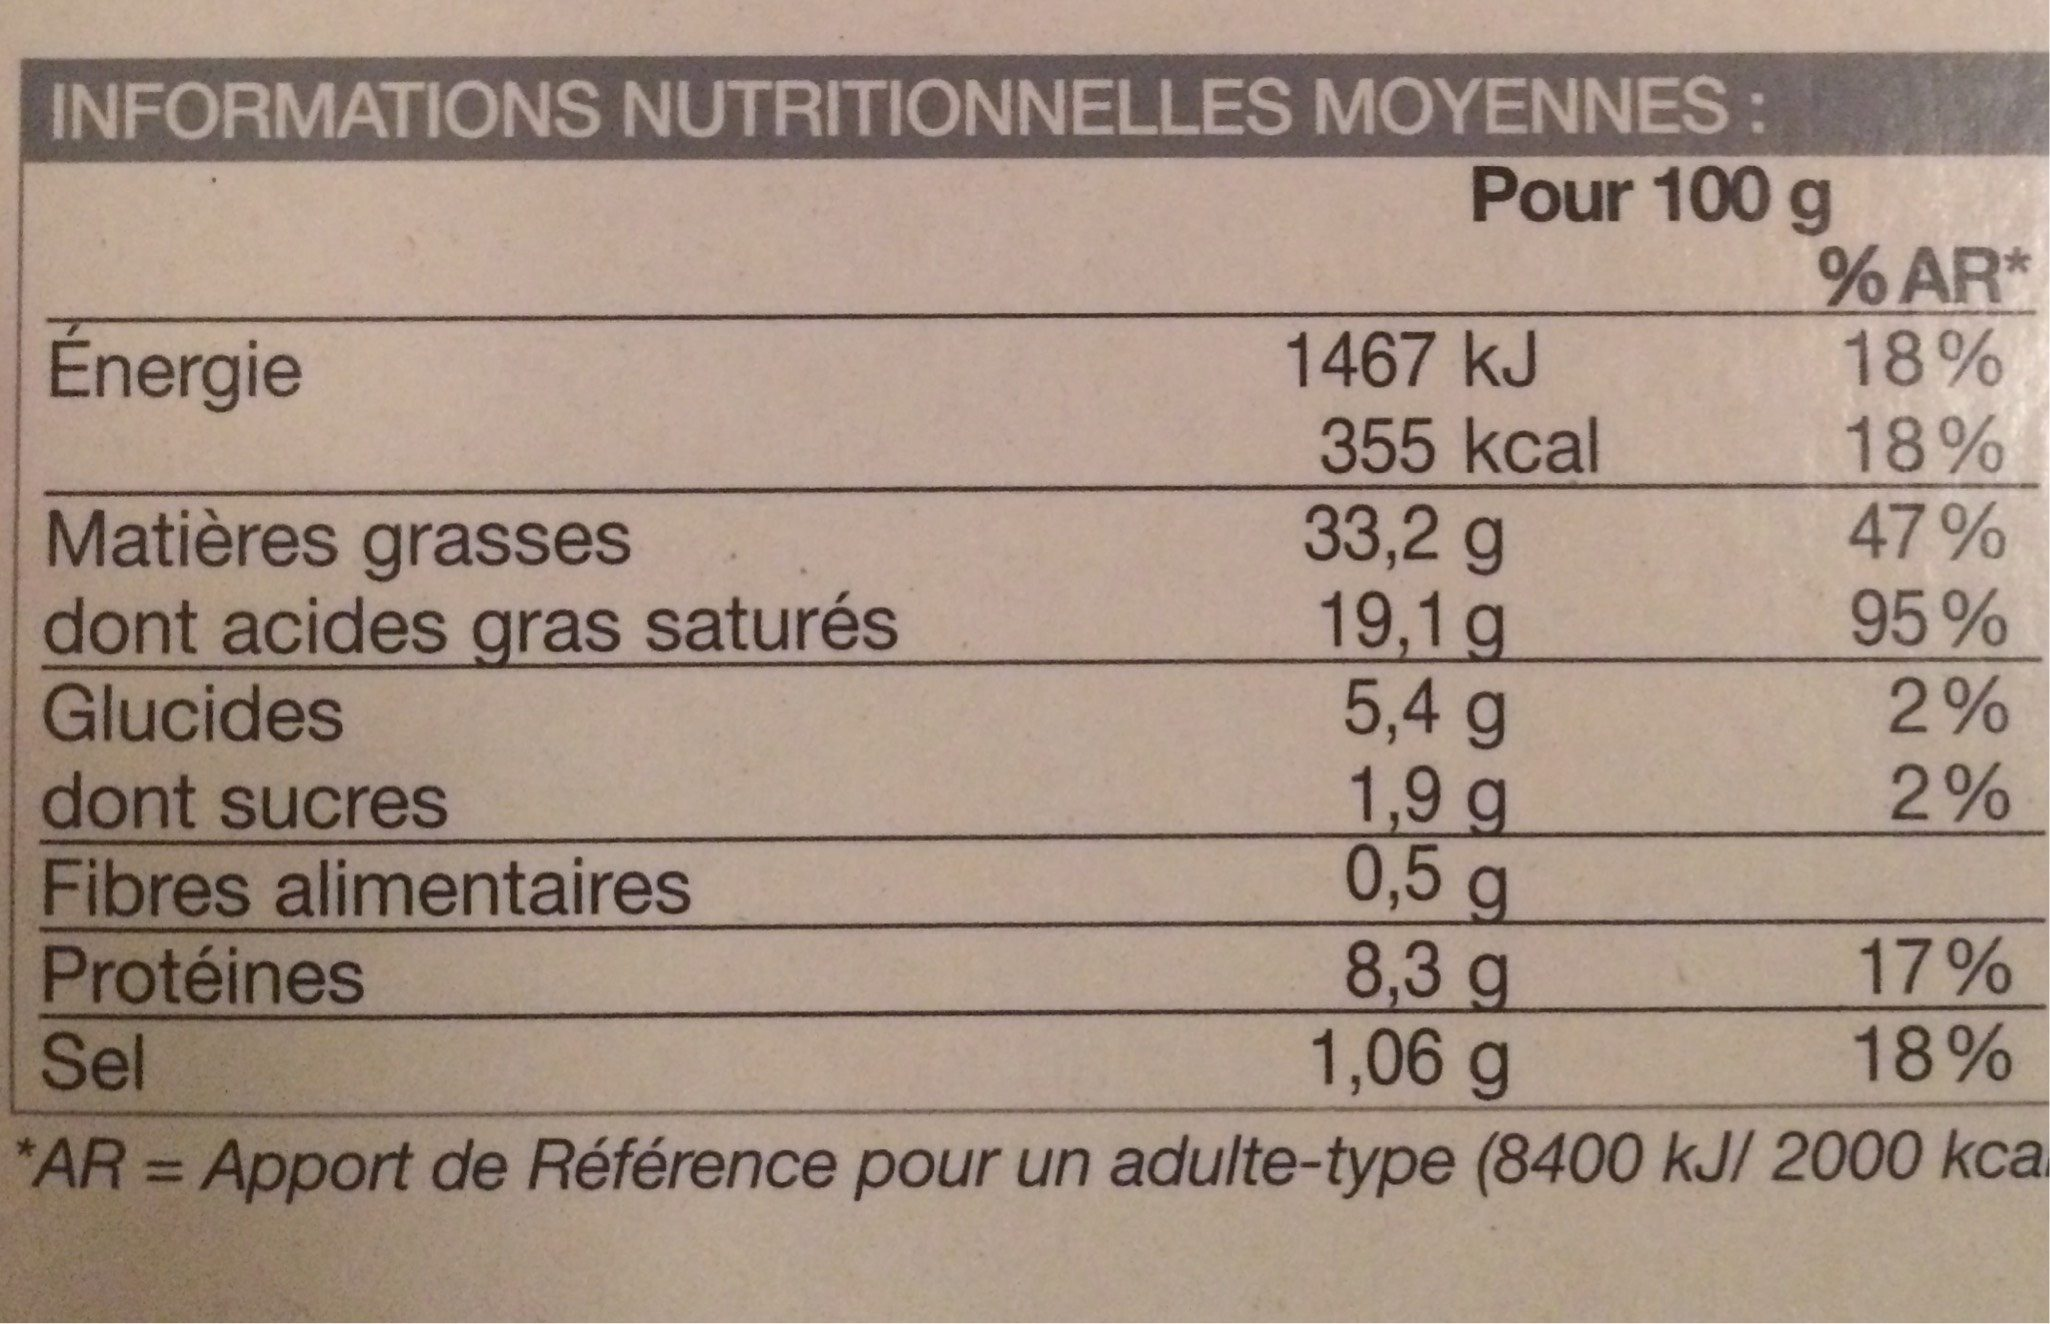 24 Moules Farcies, Boîte De 250 Grammes - Voedingswaarden - fr